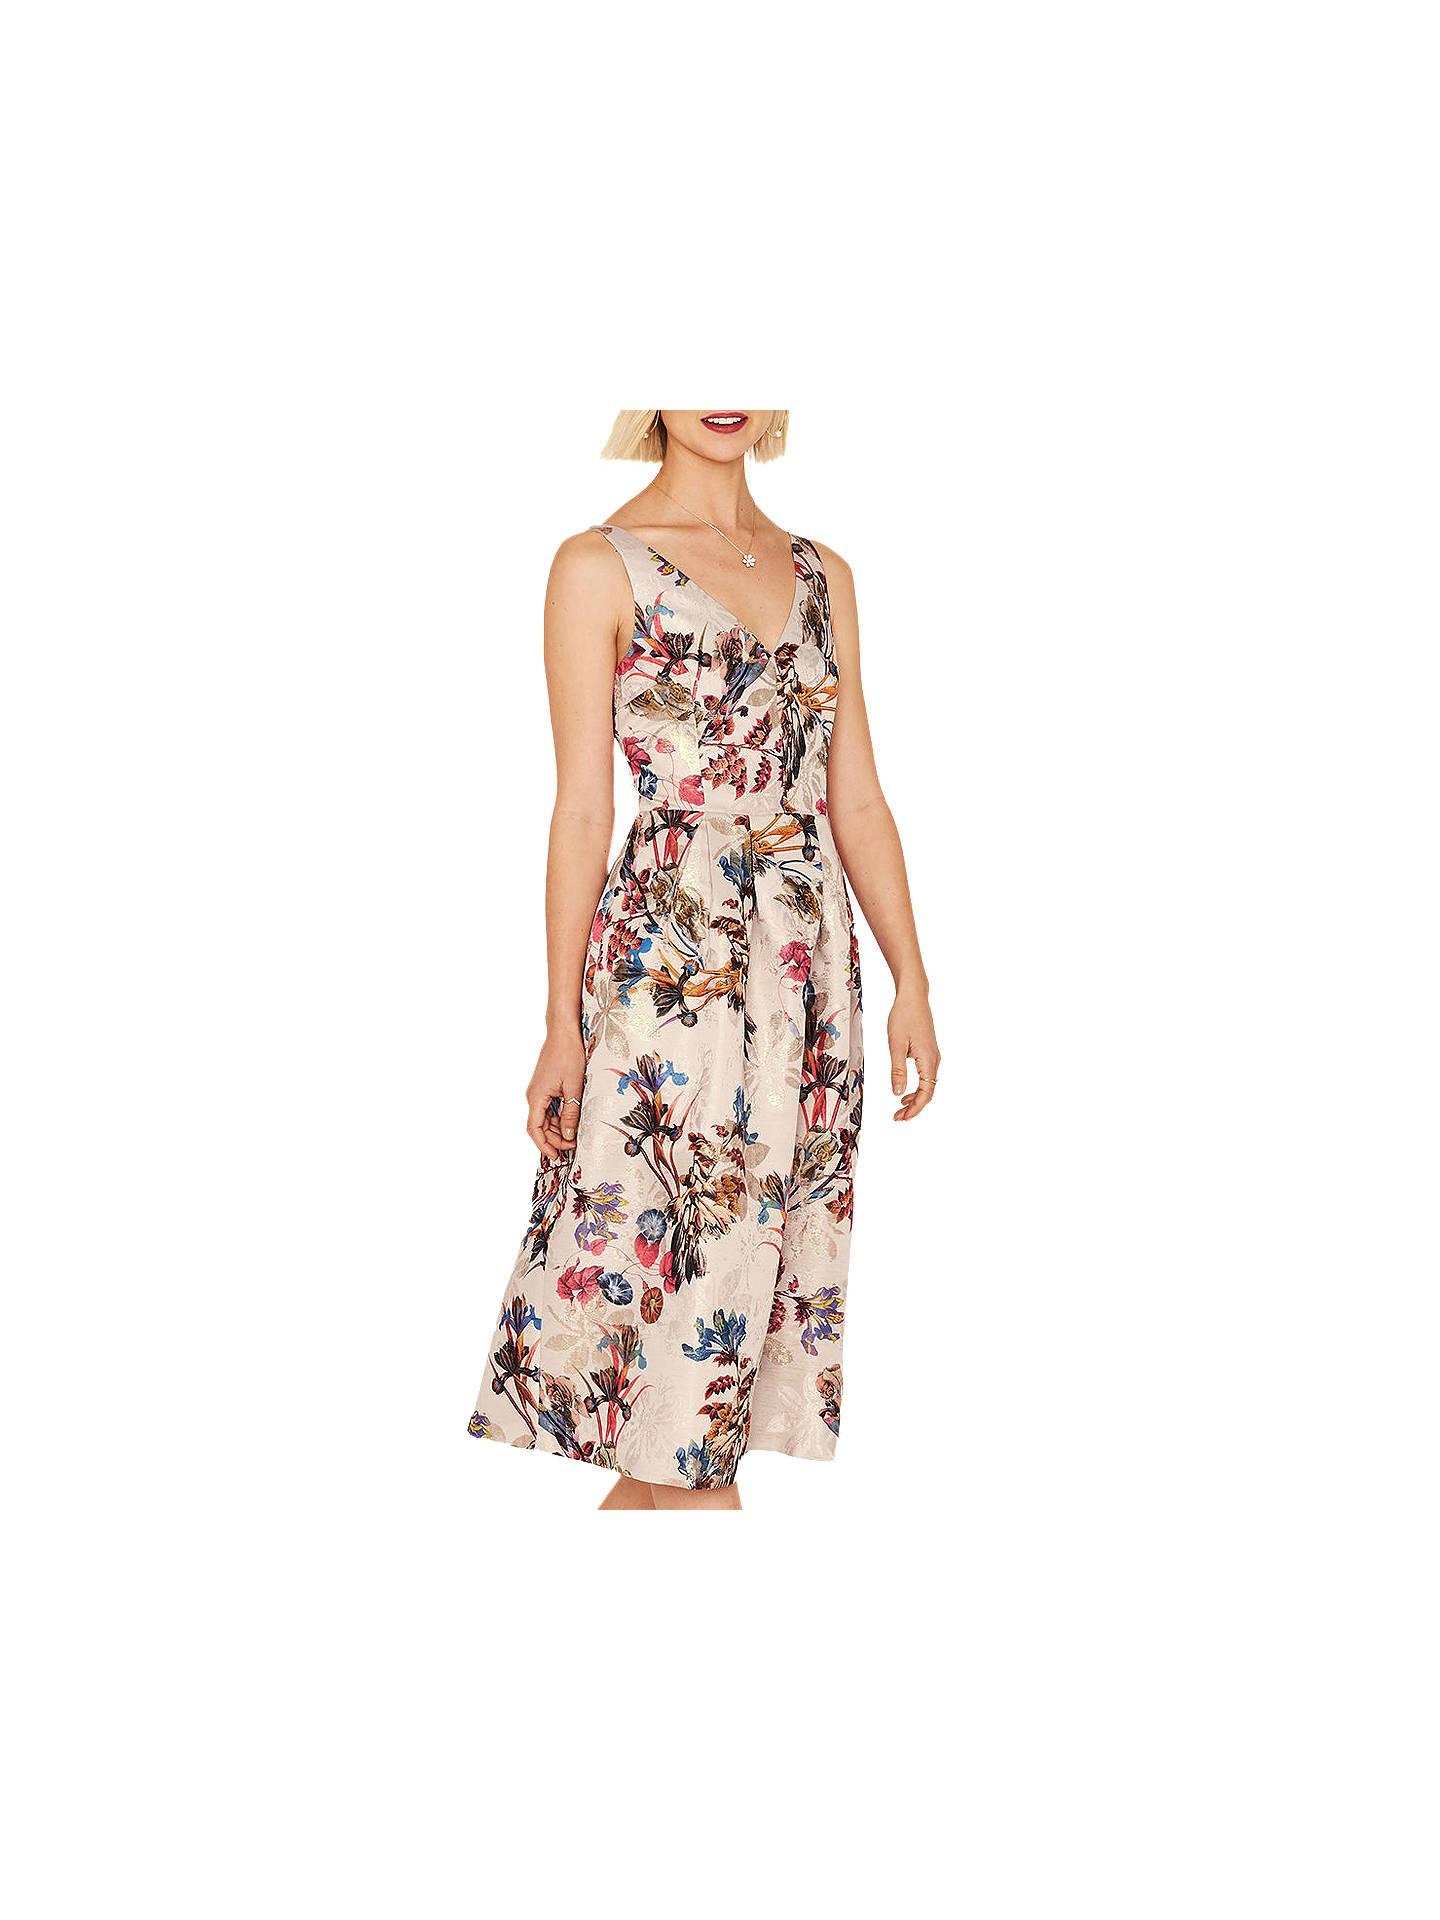 97d6a4d4af54 Buy Oasis Floral Iris Jacquard Midi Dress, Multi, 6 Online at johnlewis.com  ...